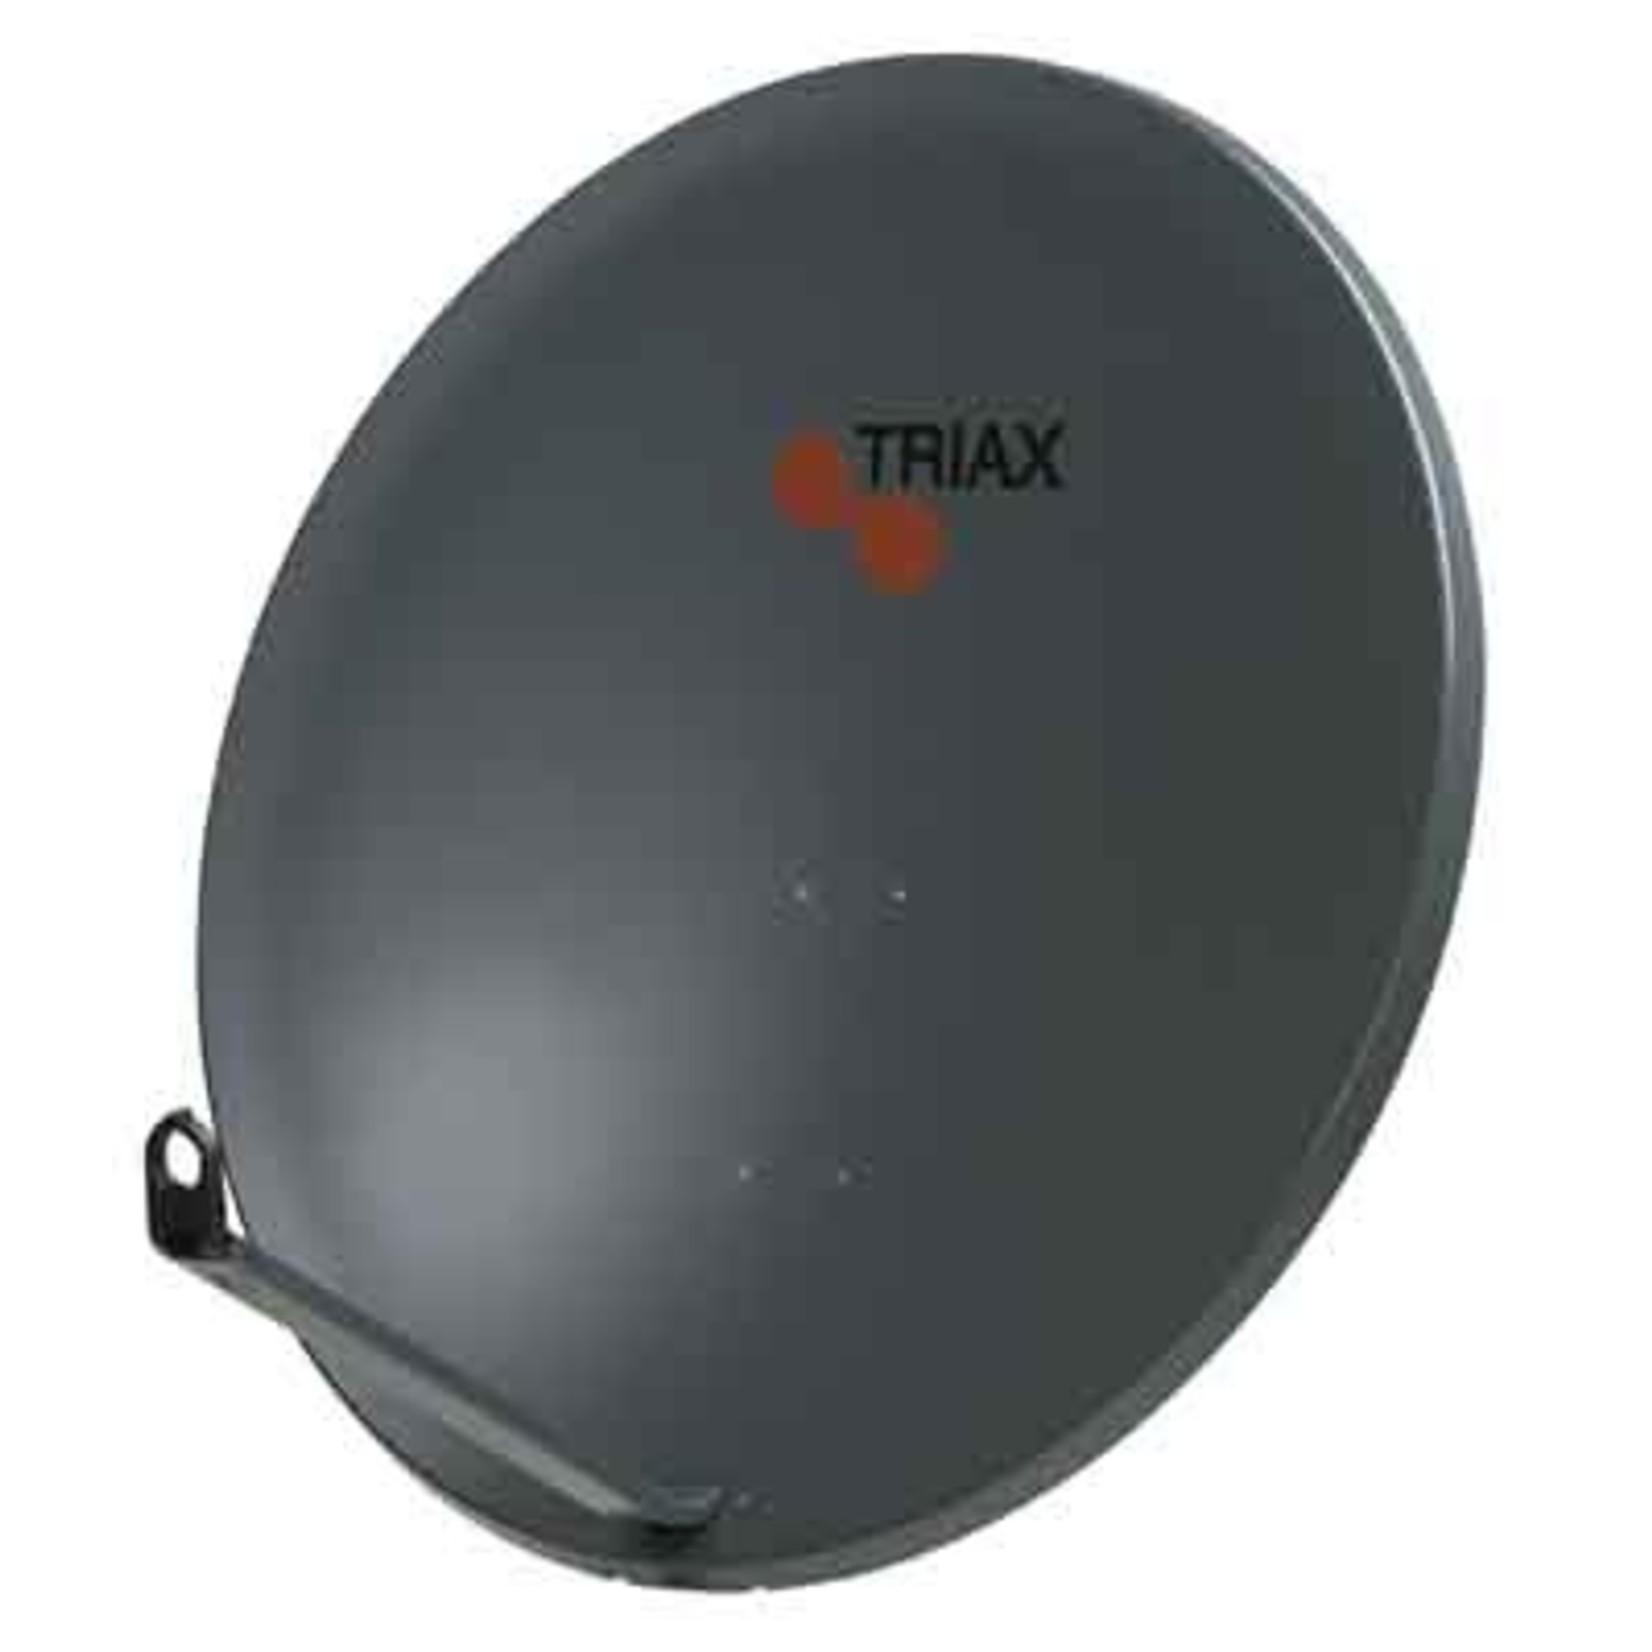 TRIAX ANTENNE OFFSET TRIAX 64 CM+TOEBEHOREN RAL 7016